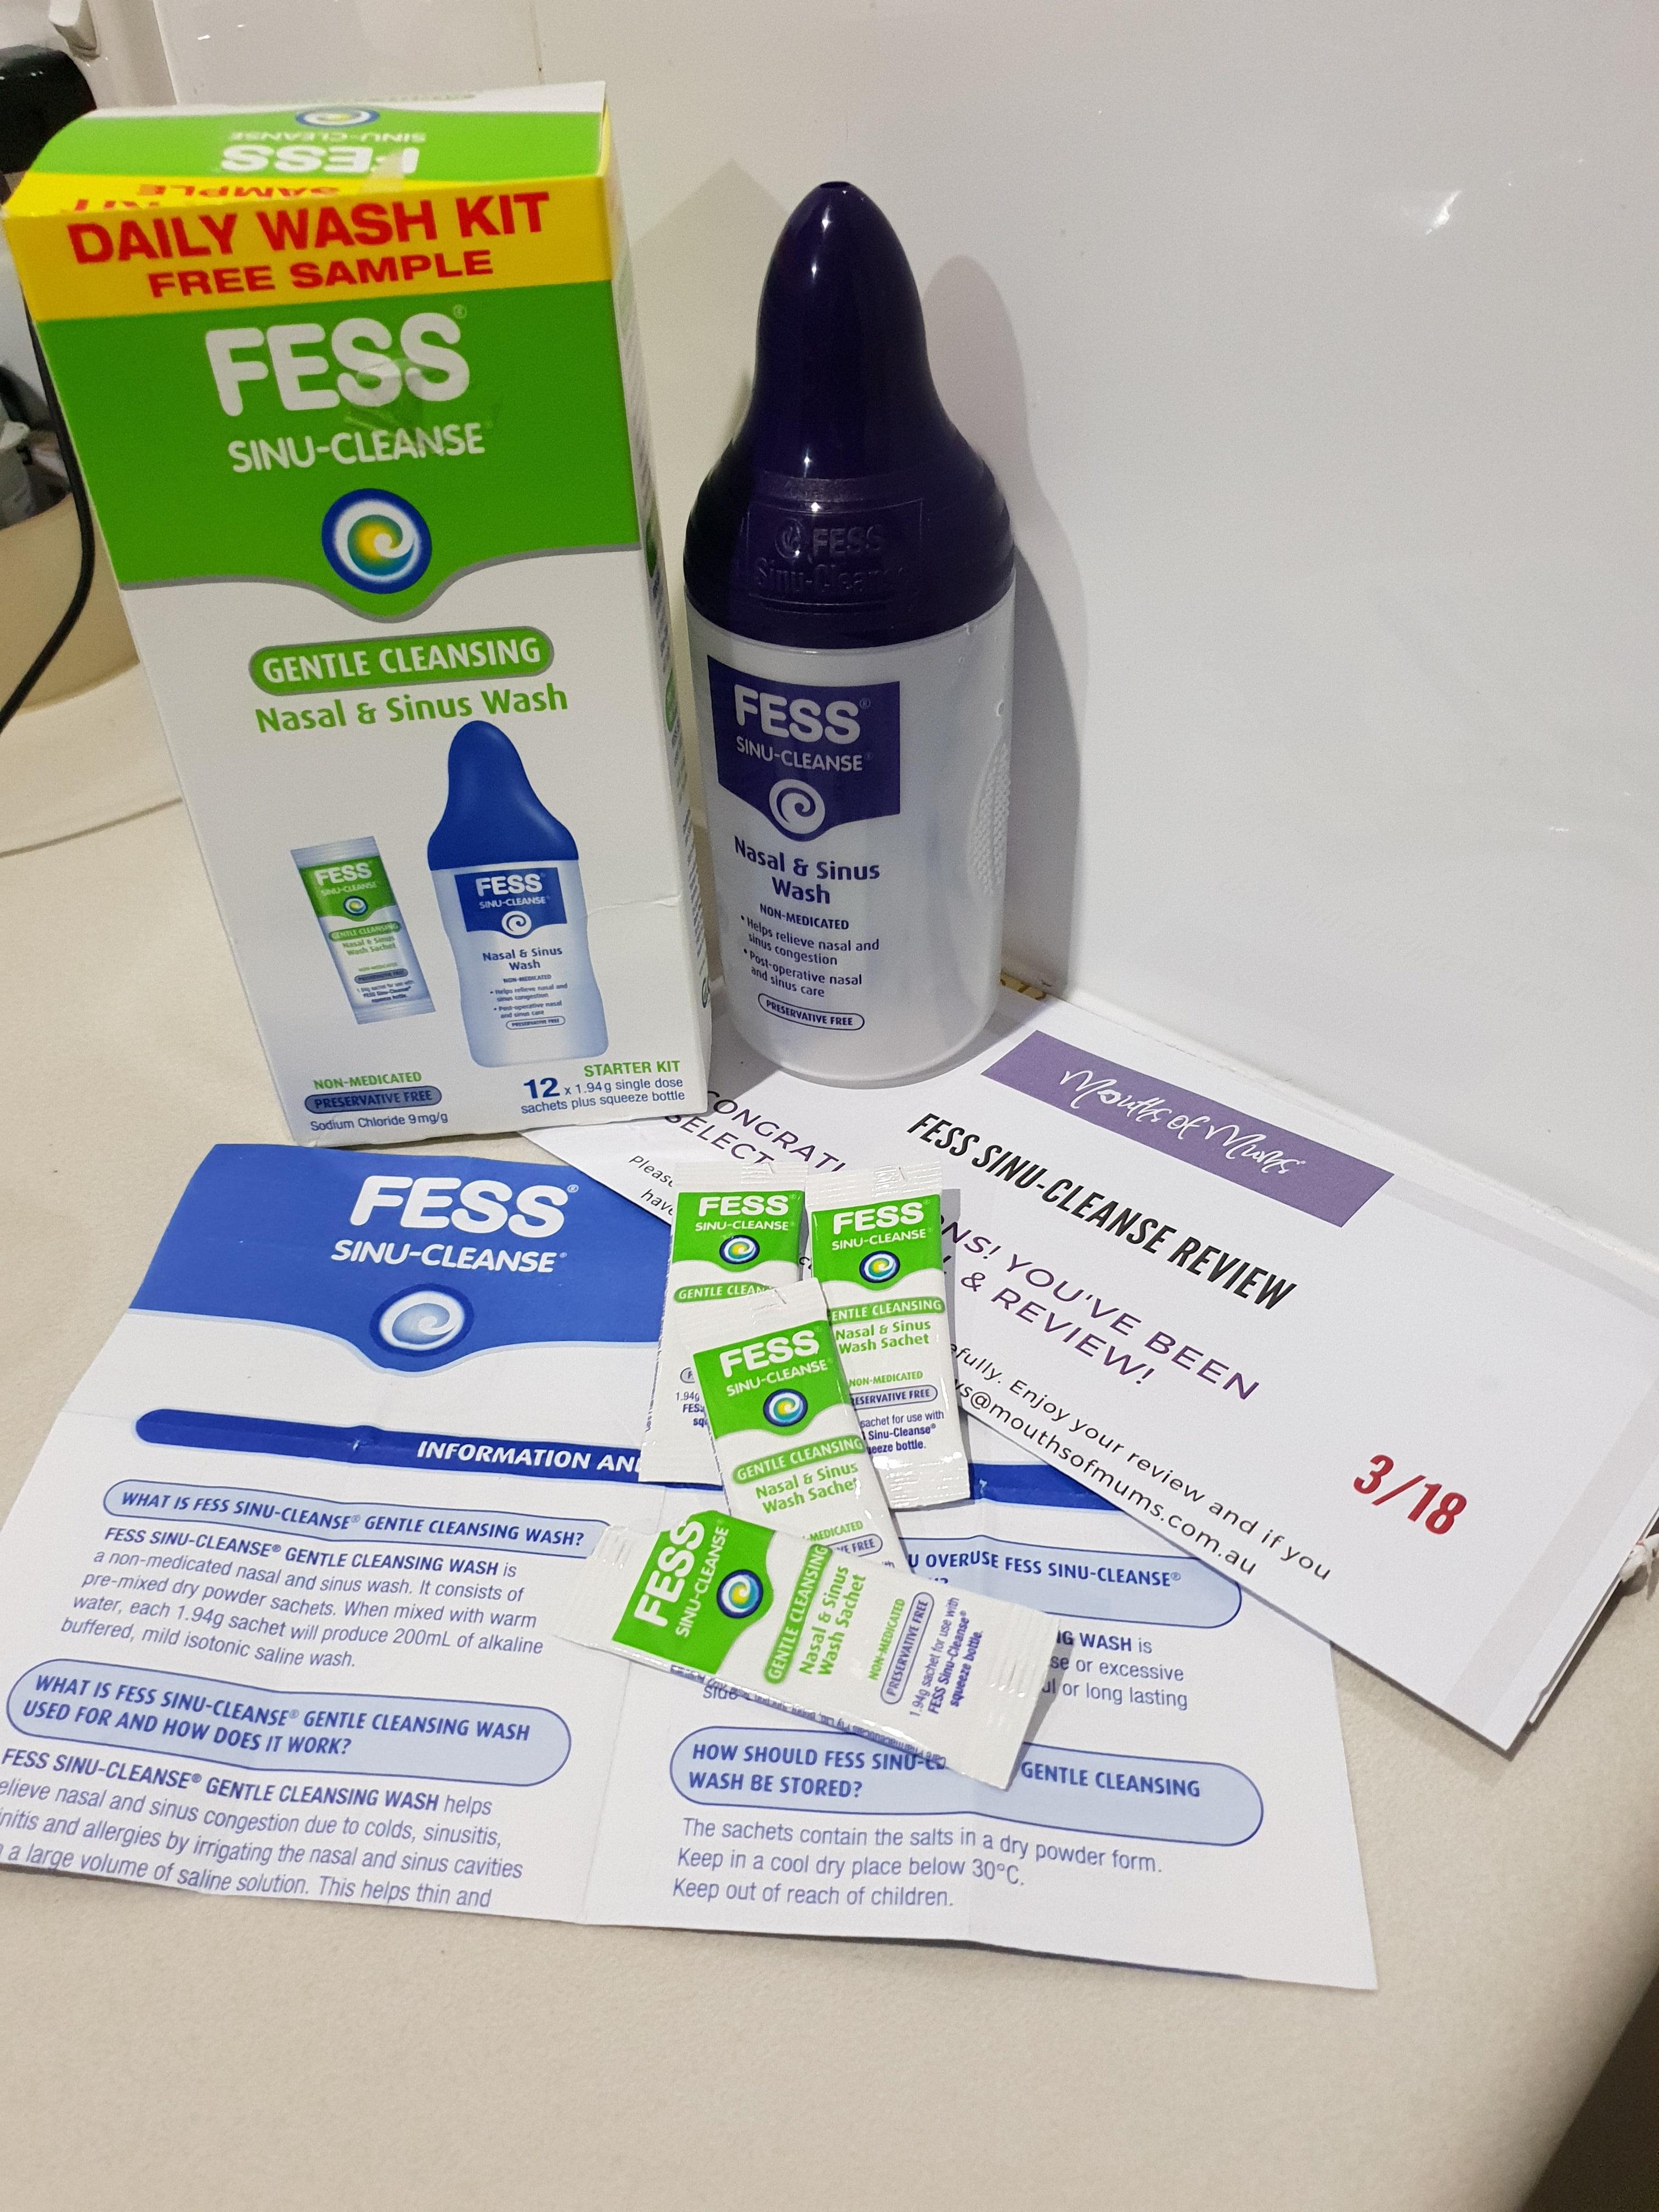 6f44bab4c9b8 FESS® Sinu-Cleanse Gentle Cleansing Nasal   Sinus Wash Kit Product Review